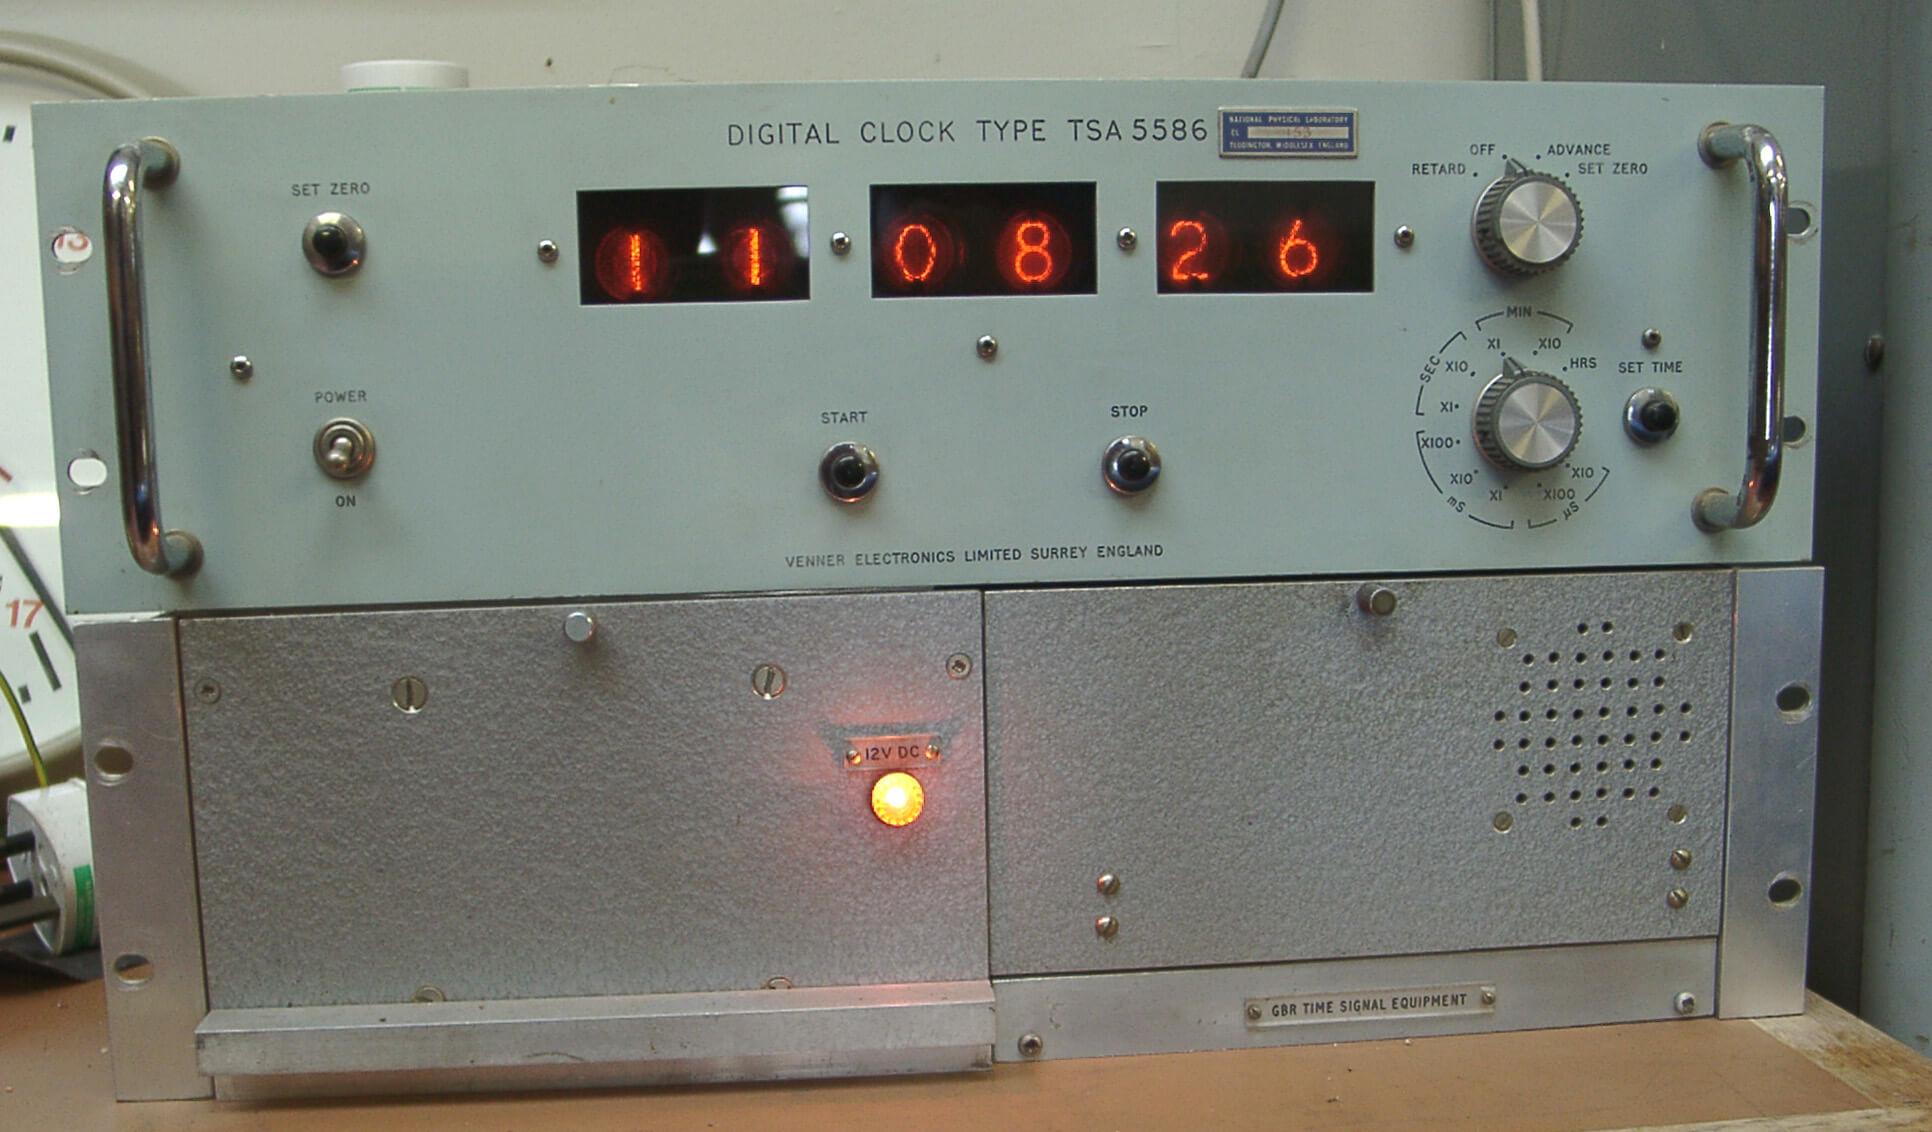 310 Venner Atomic Clock & GBR TS Equip